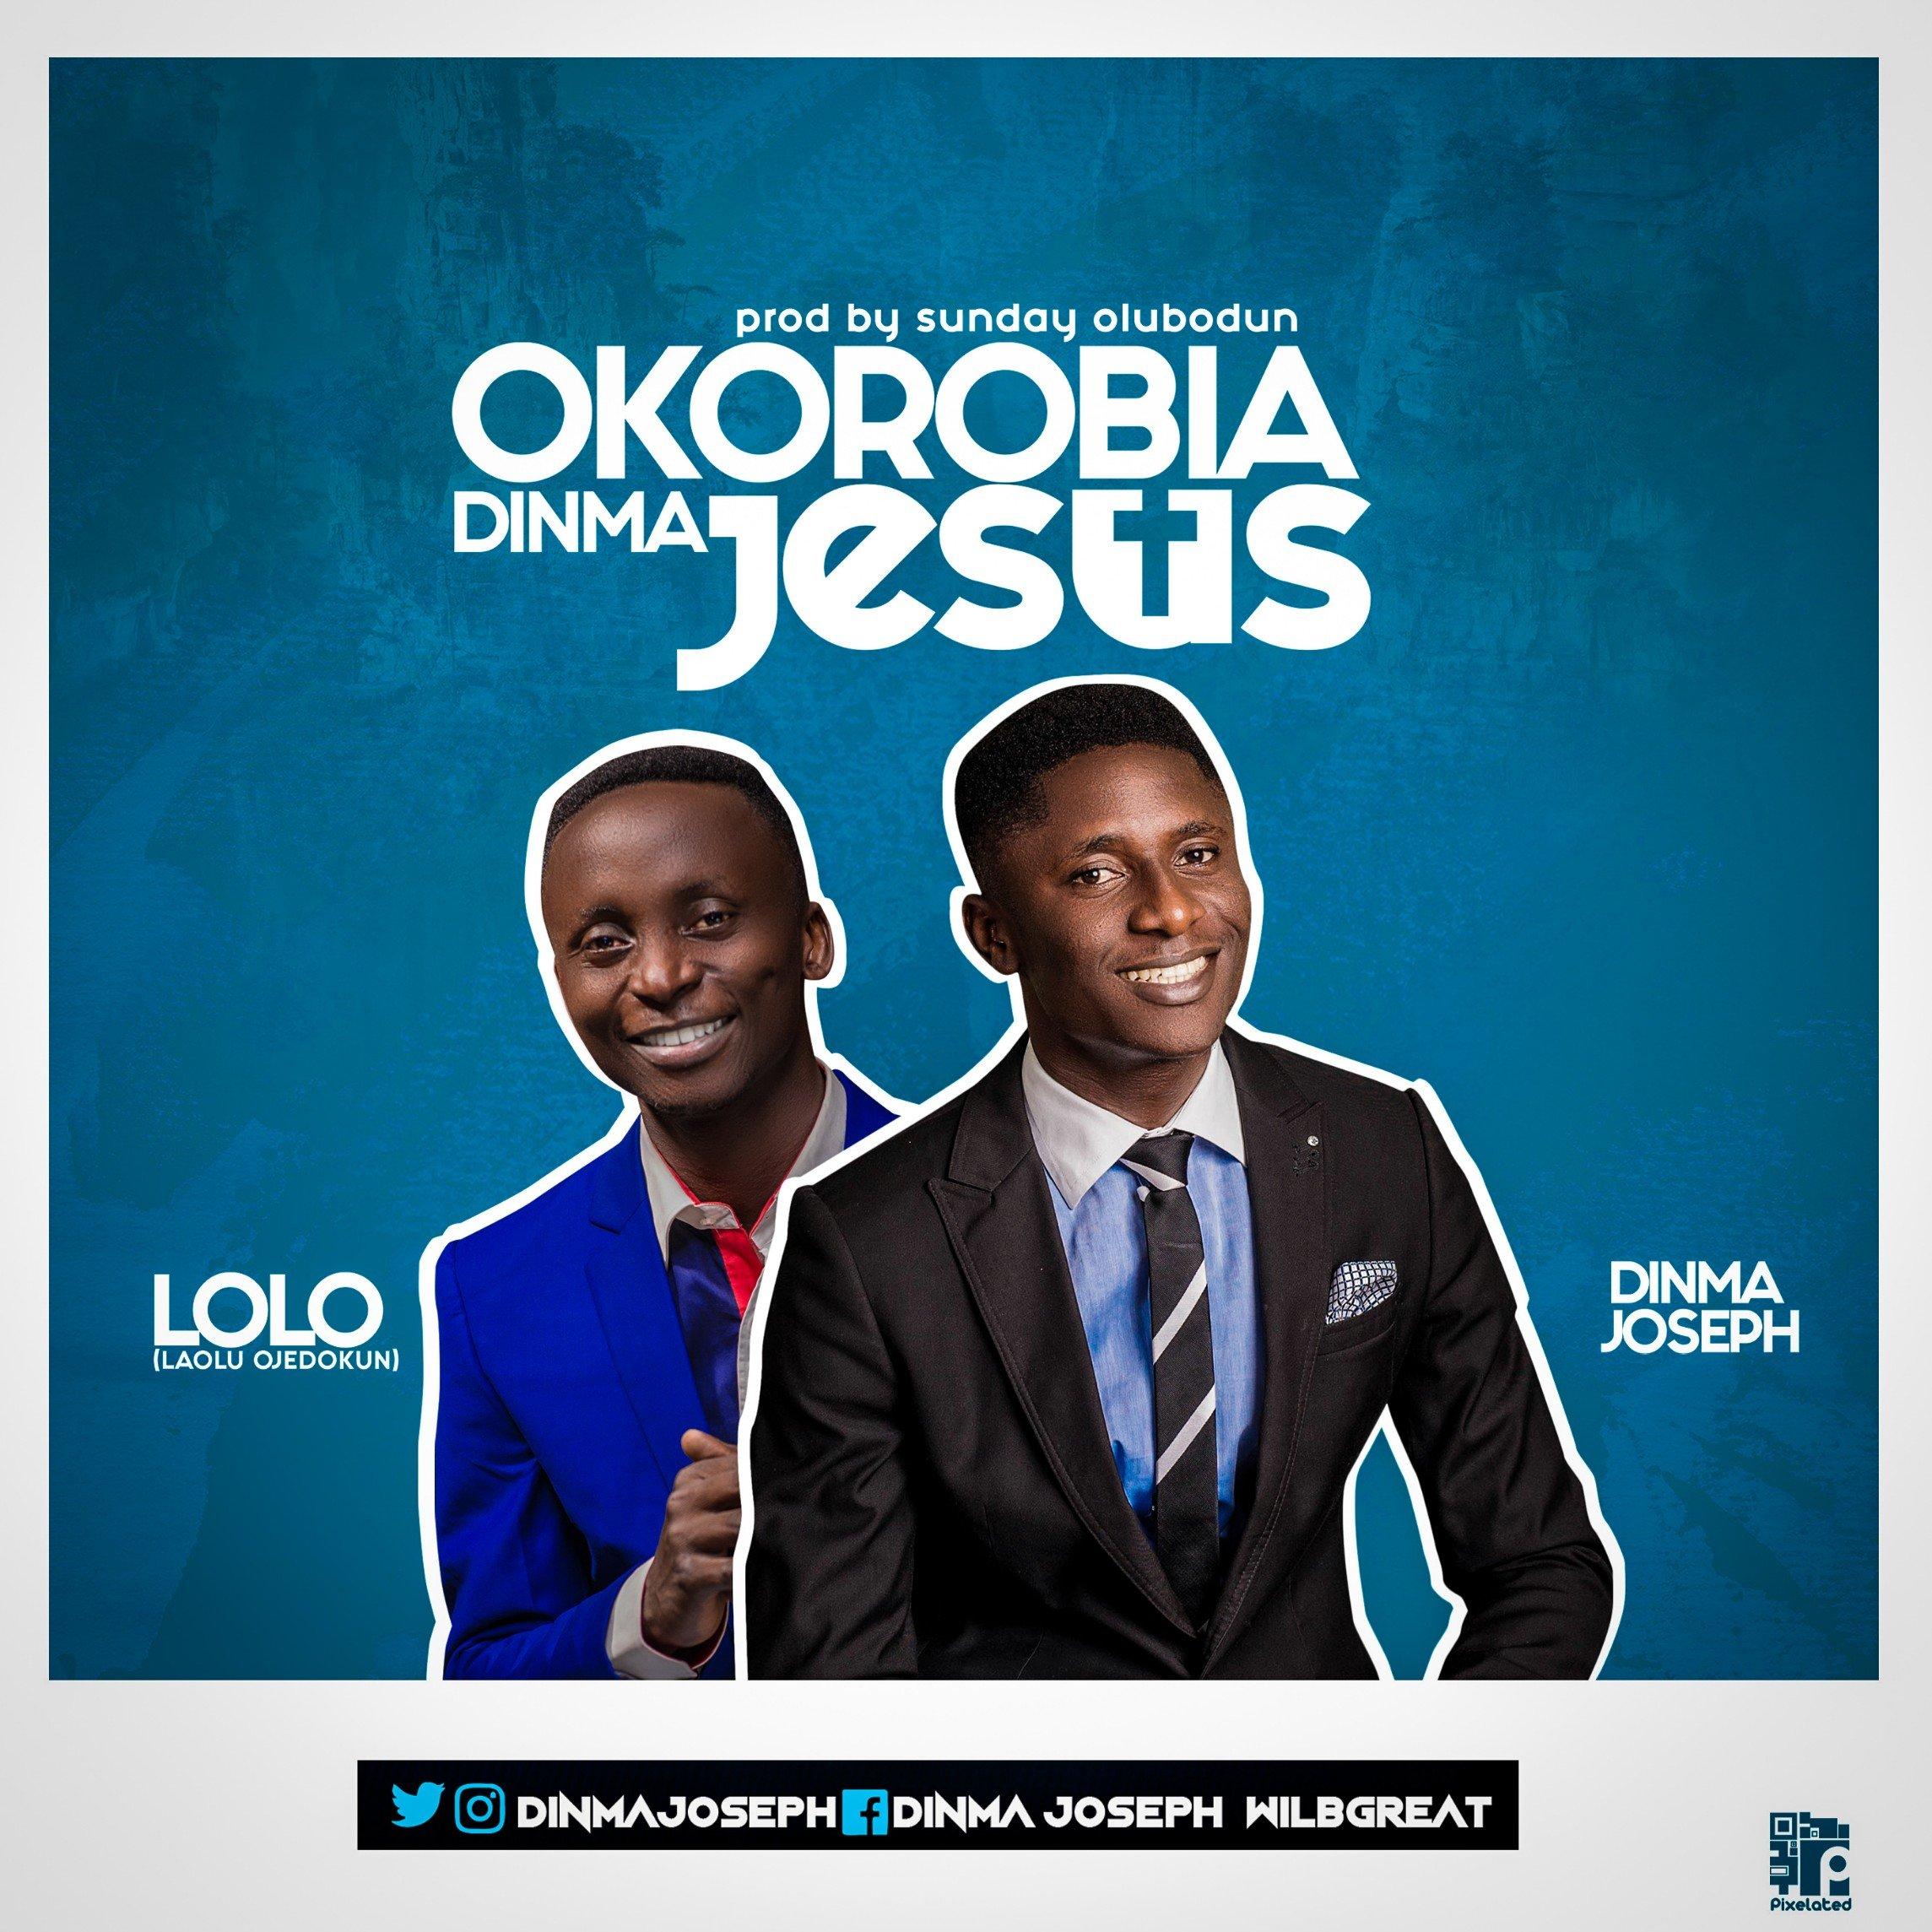 DOWNLOAD Music: Dinma Joseph – Okorobia Dinma Jesus (ft. Lolo)